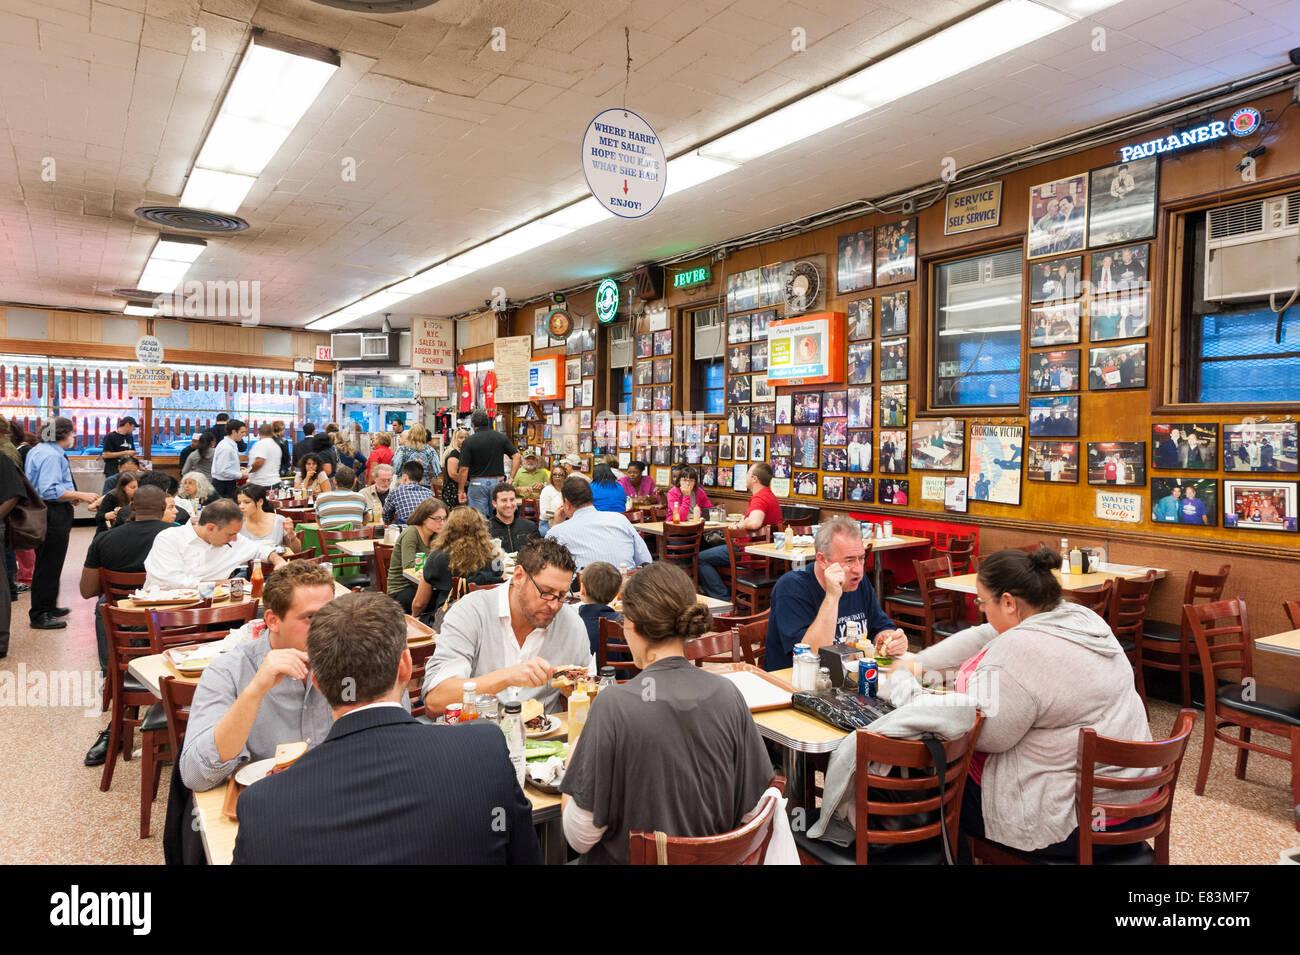 Katz's Deli, New York City, USA - Stock Image